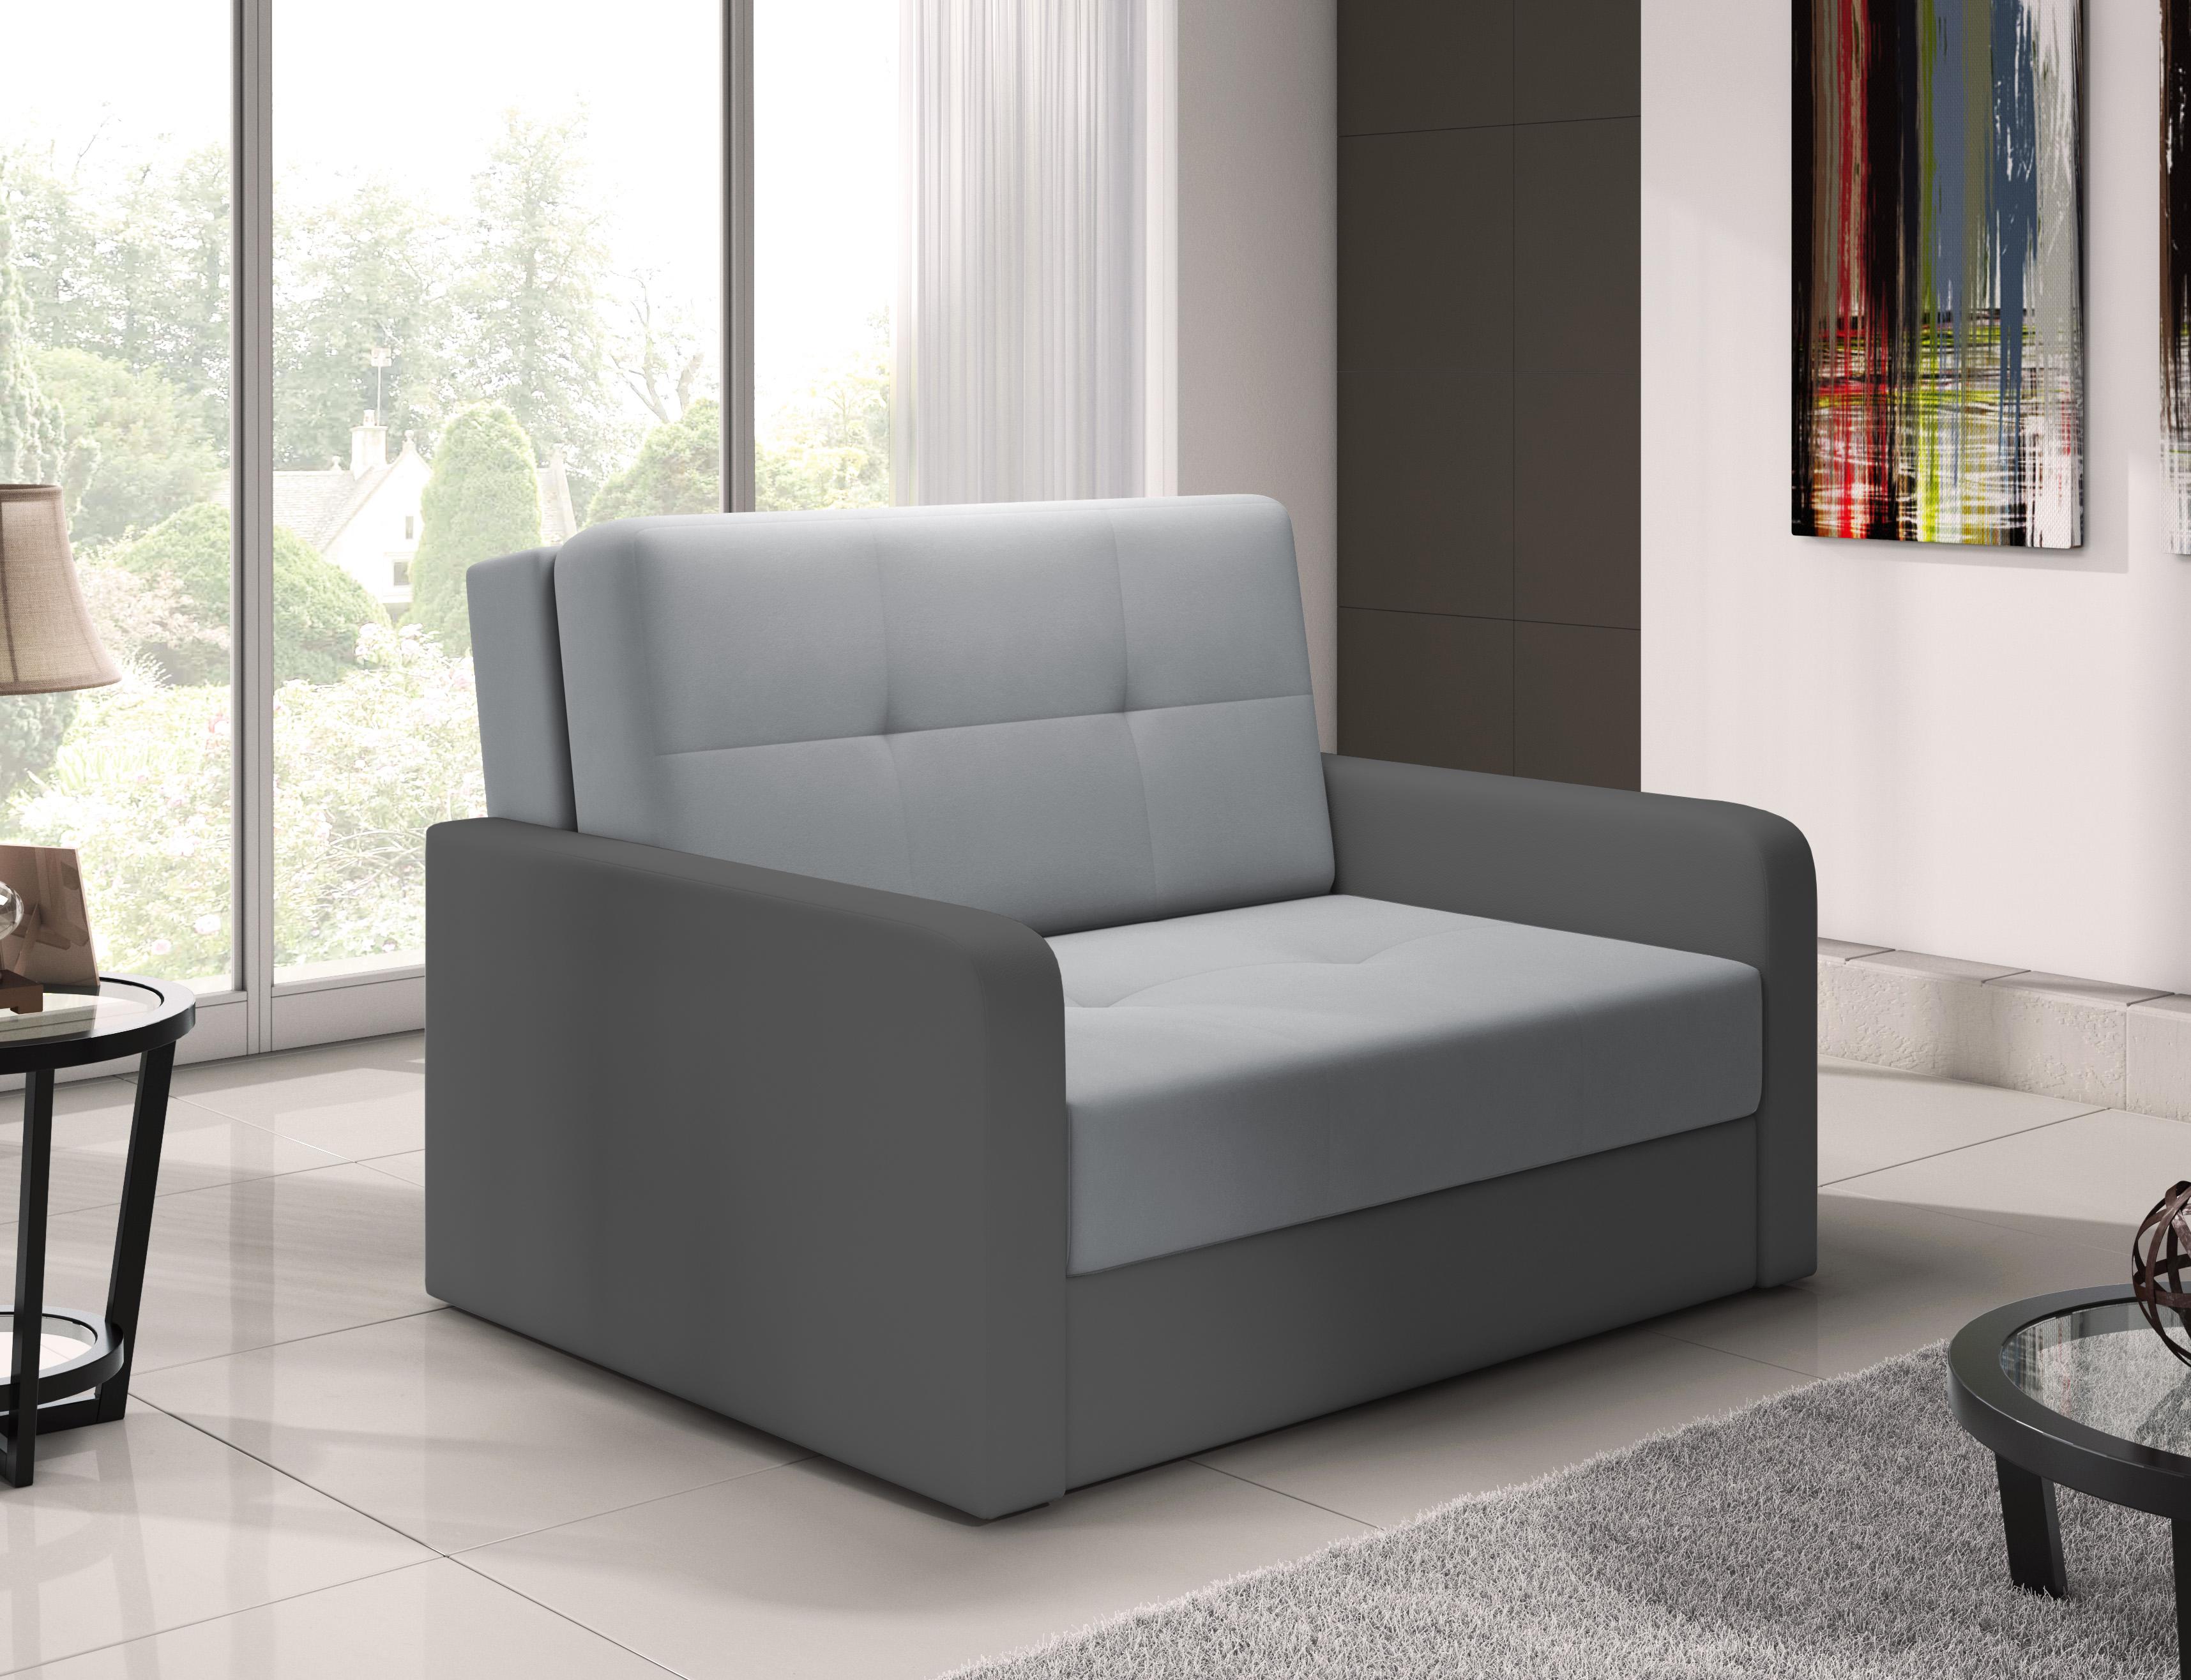 kleines sofa mit schlaffunktion schlafsessel jugendsessel couch blau grau erik2 ebay. Black Bedroom Furniture Sets. Home Design Ideas